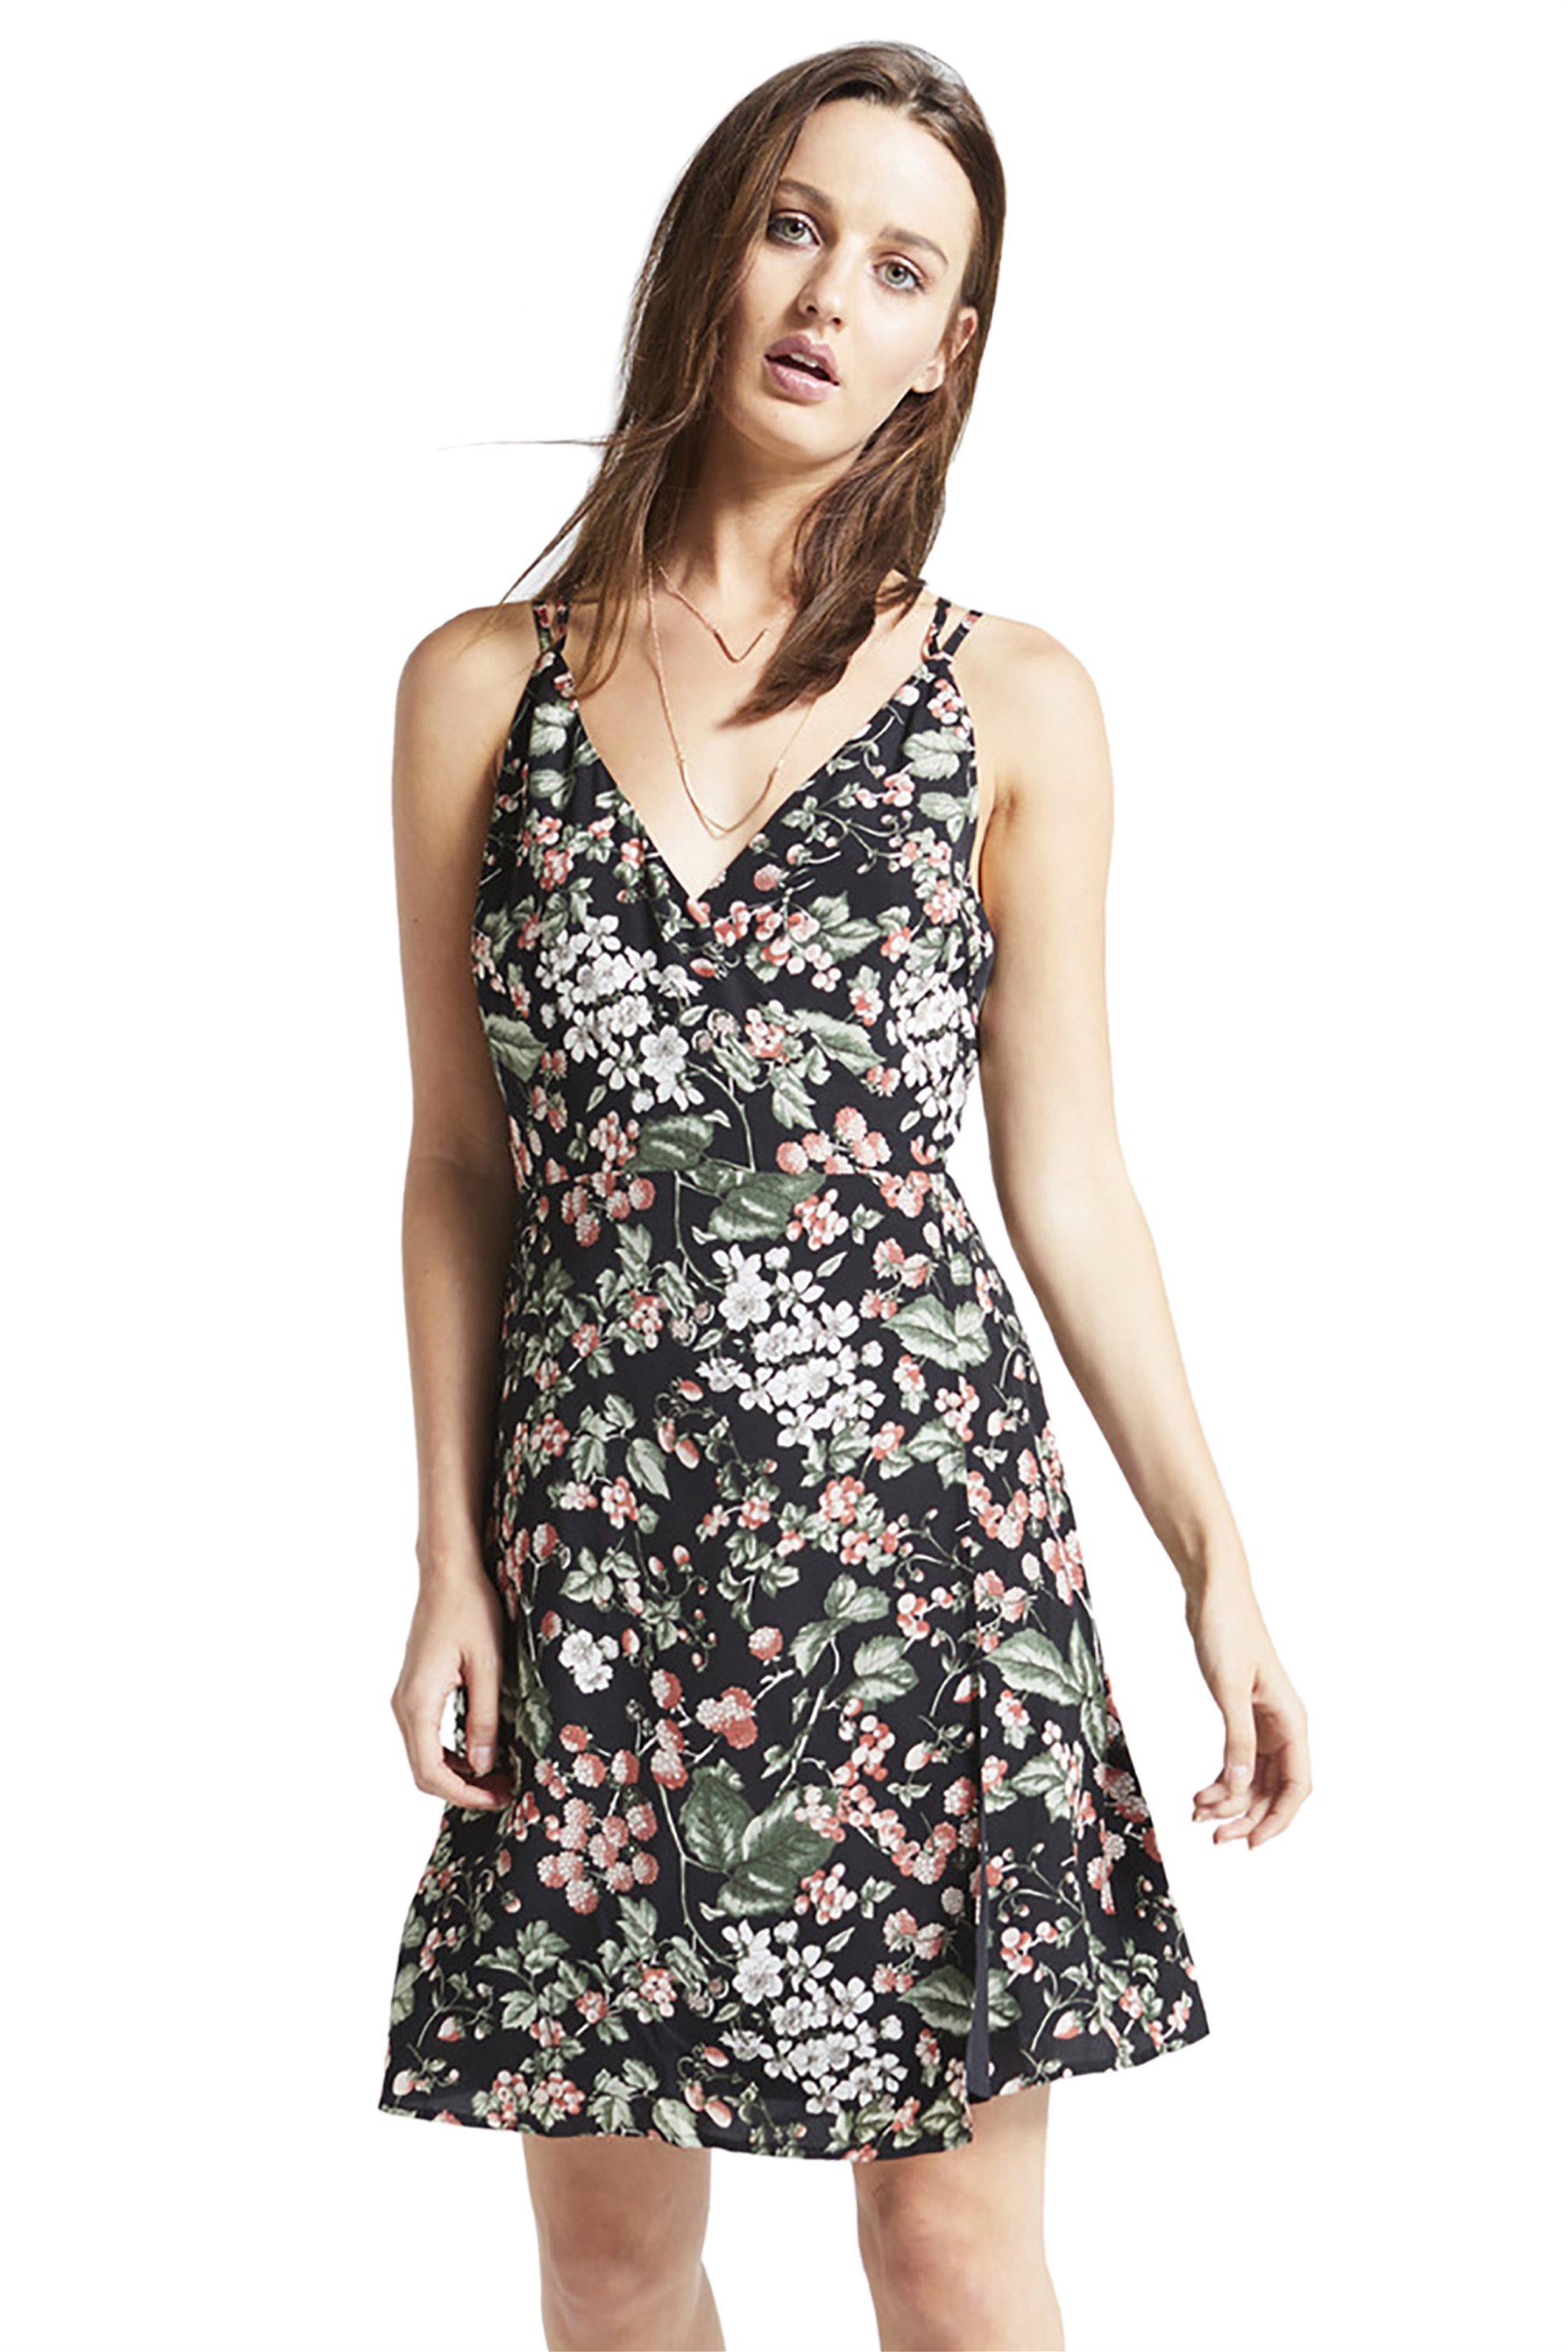 ed4f7e18a76b Γυναικεία   Ρούχα   Φορέματα   Καθημερινά   Γυναικείο φόρεμα εμπριμέ ...